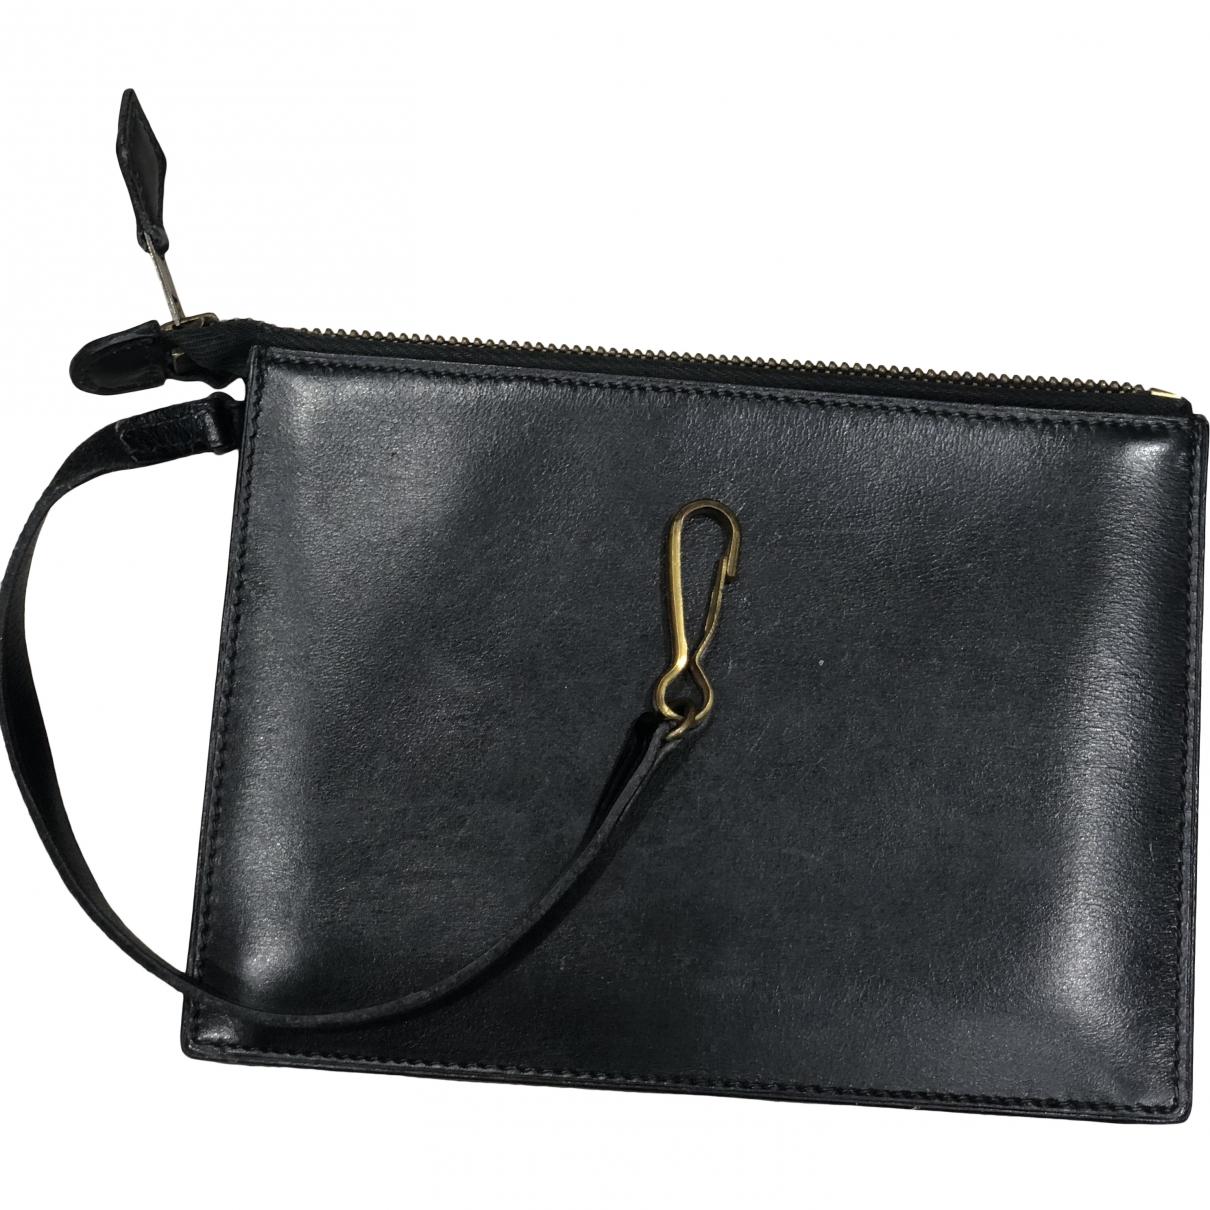 Hermes \N Clutch in  Schwarz Leder